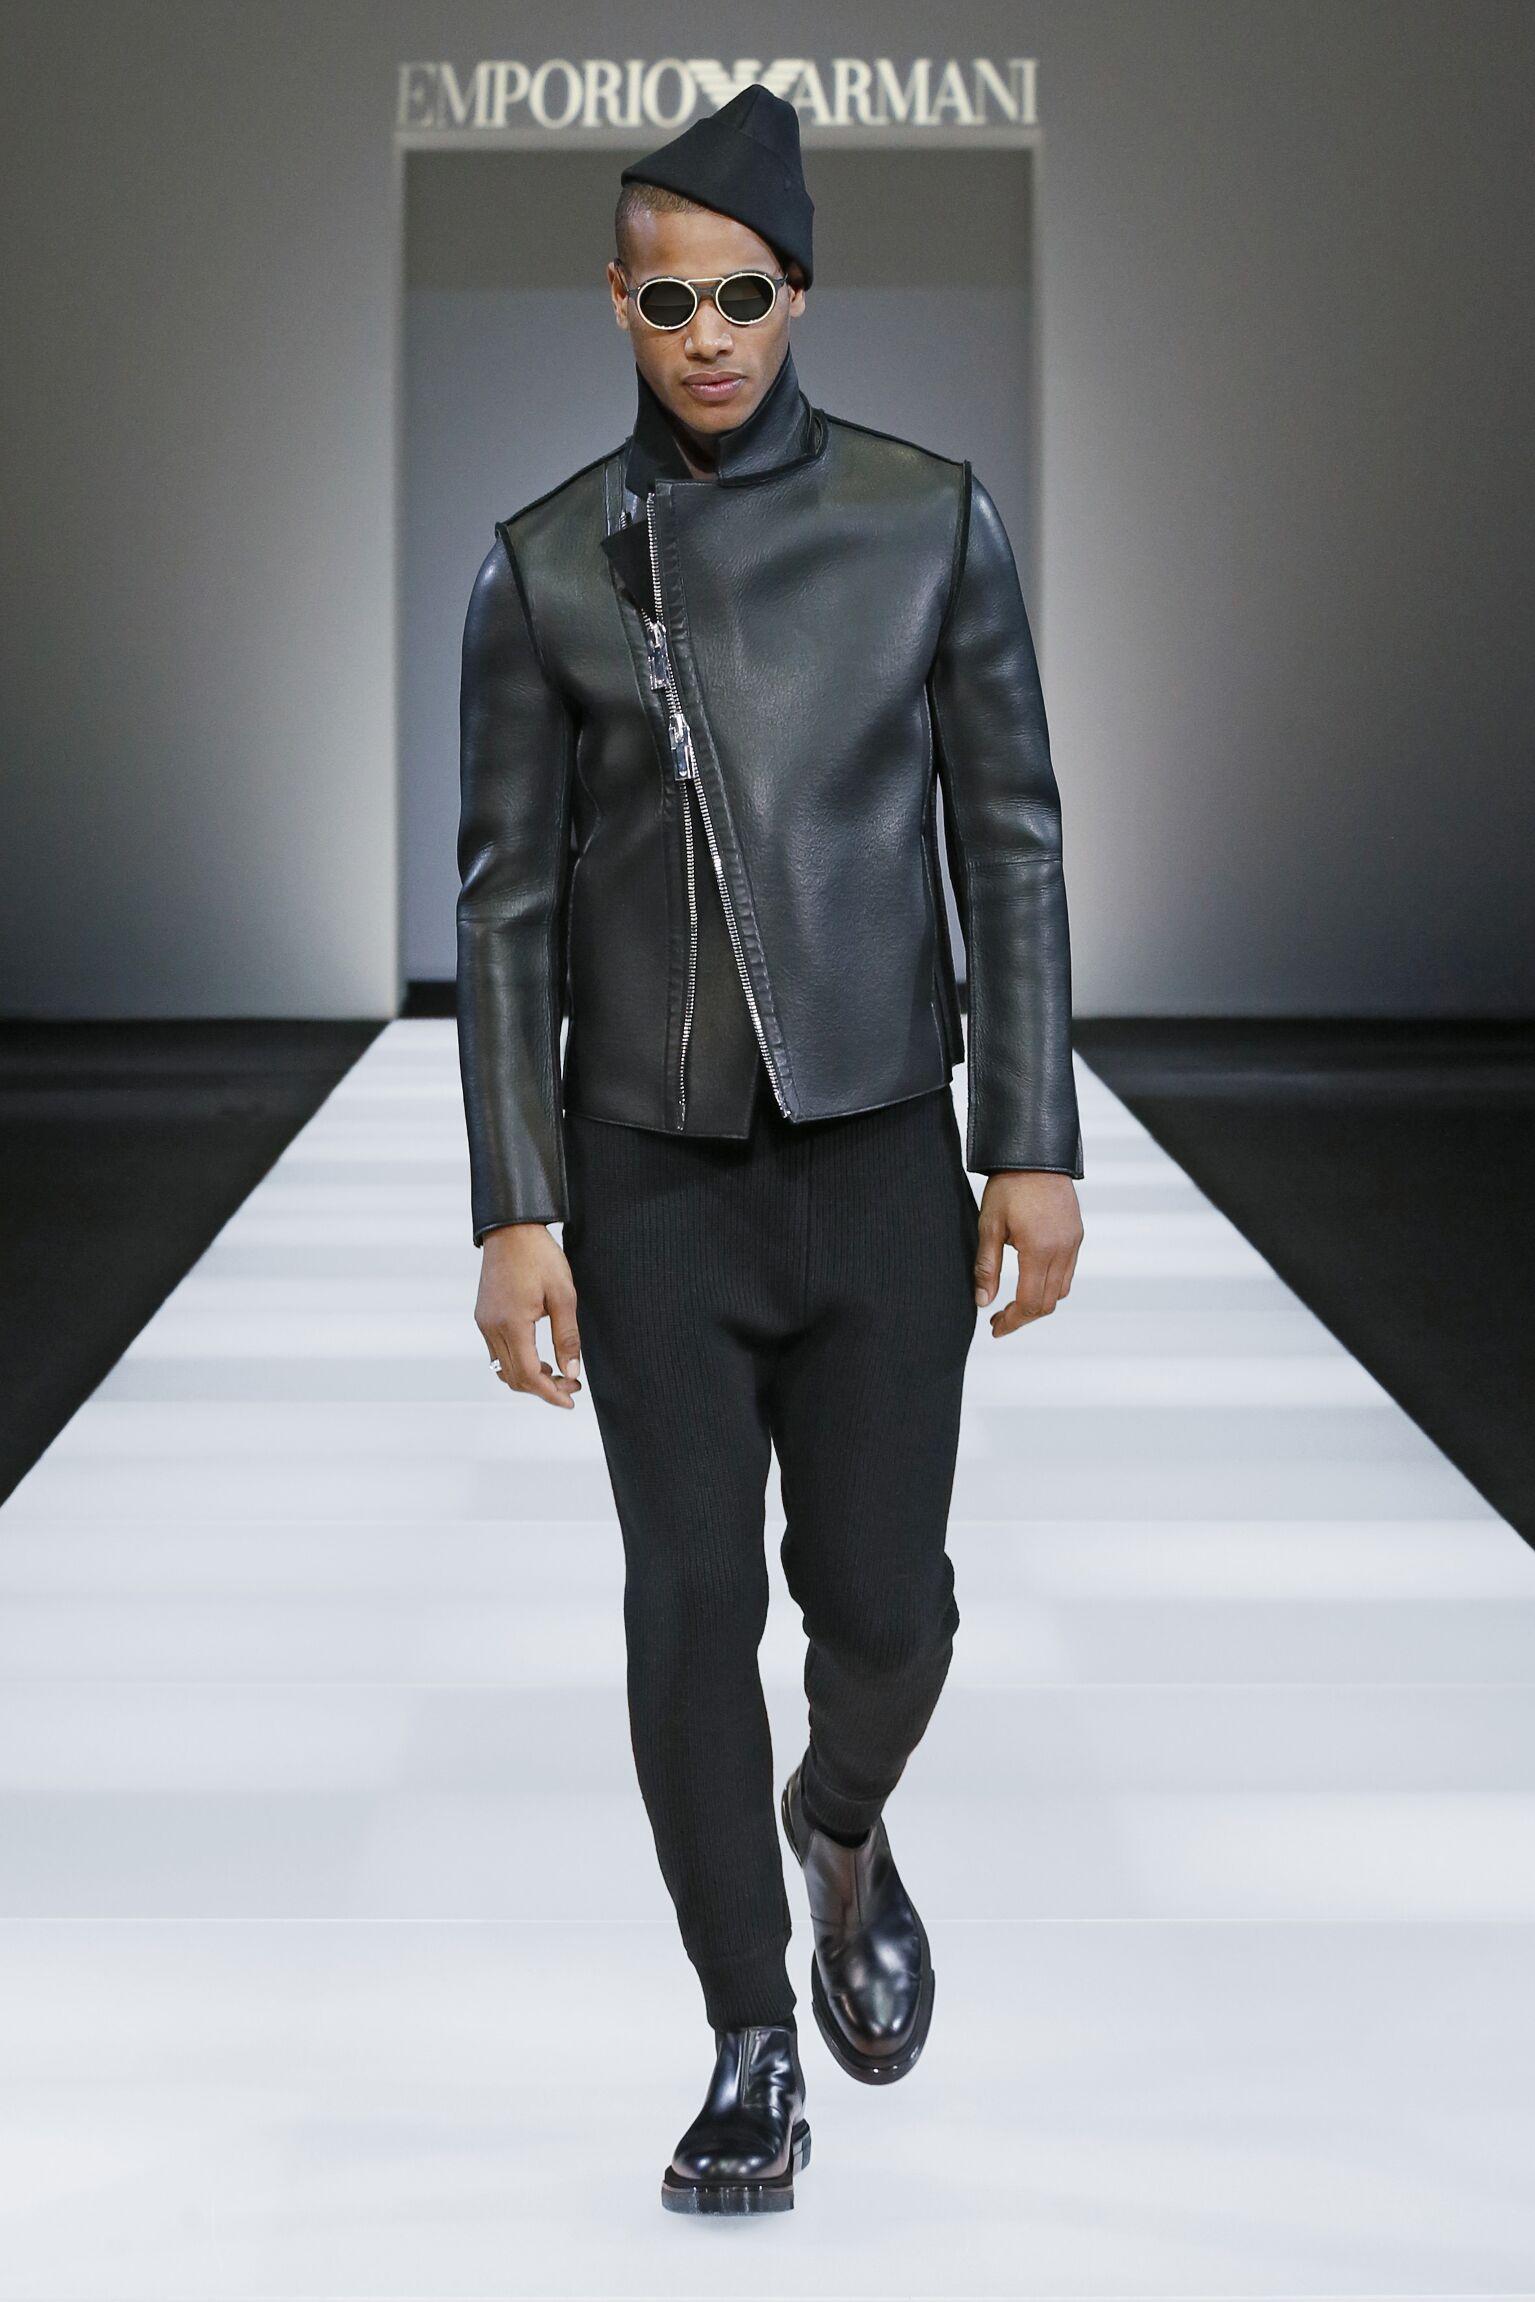 Fall Emporio Armani Collection Fashion Man